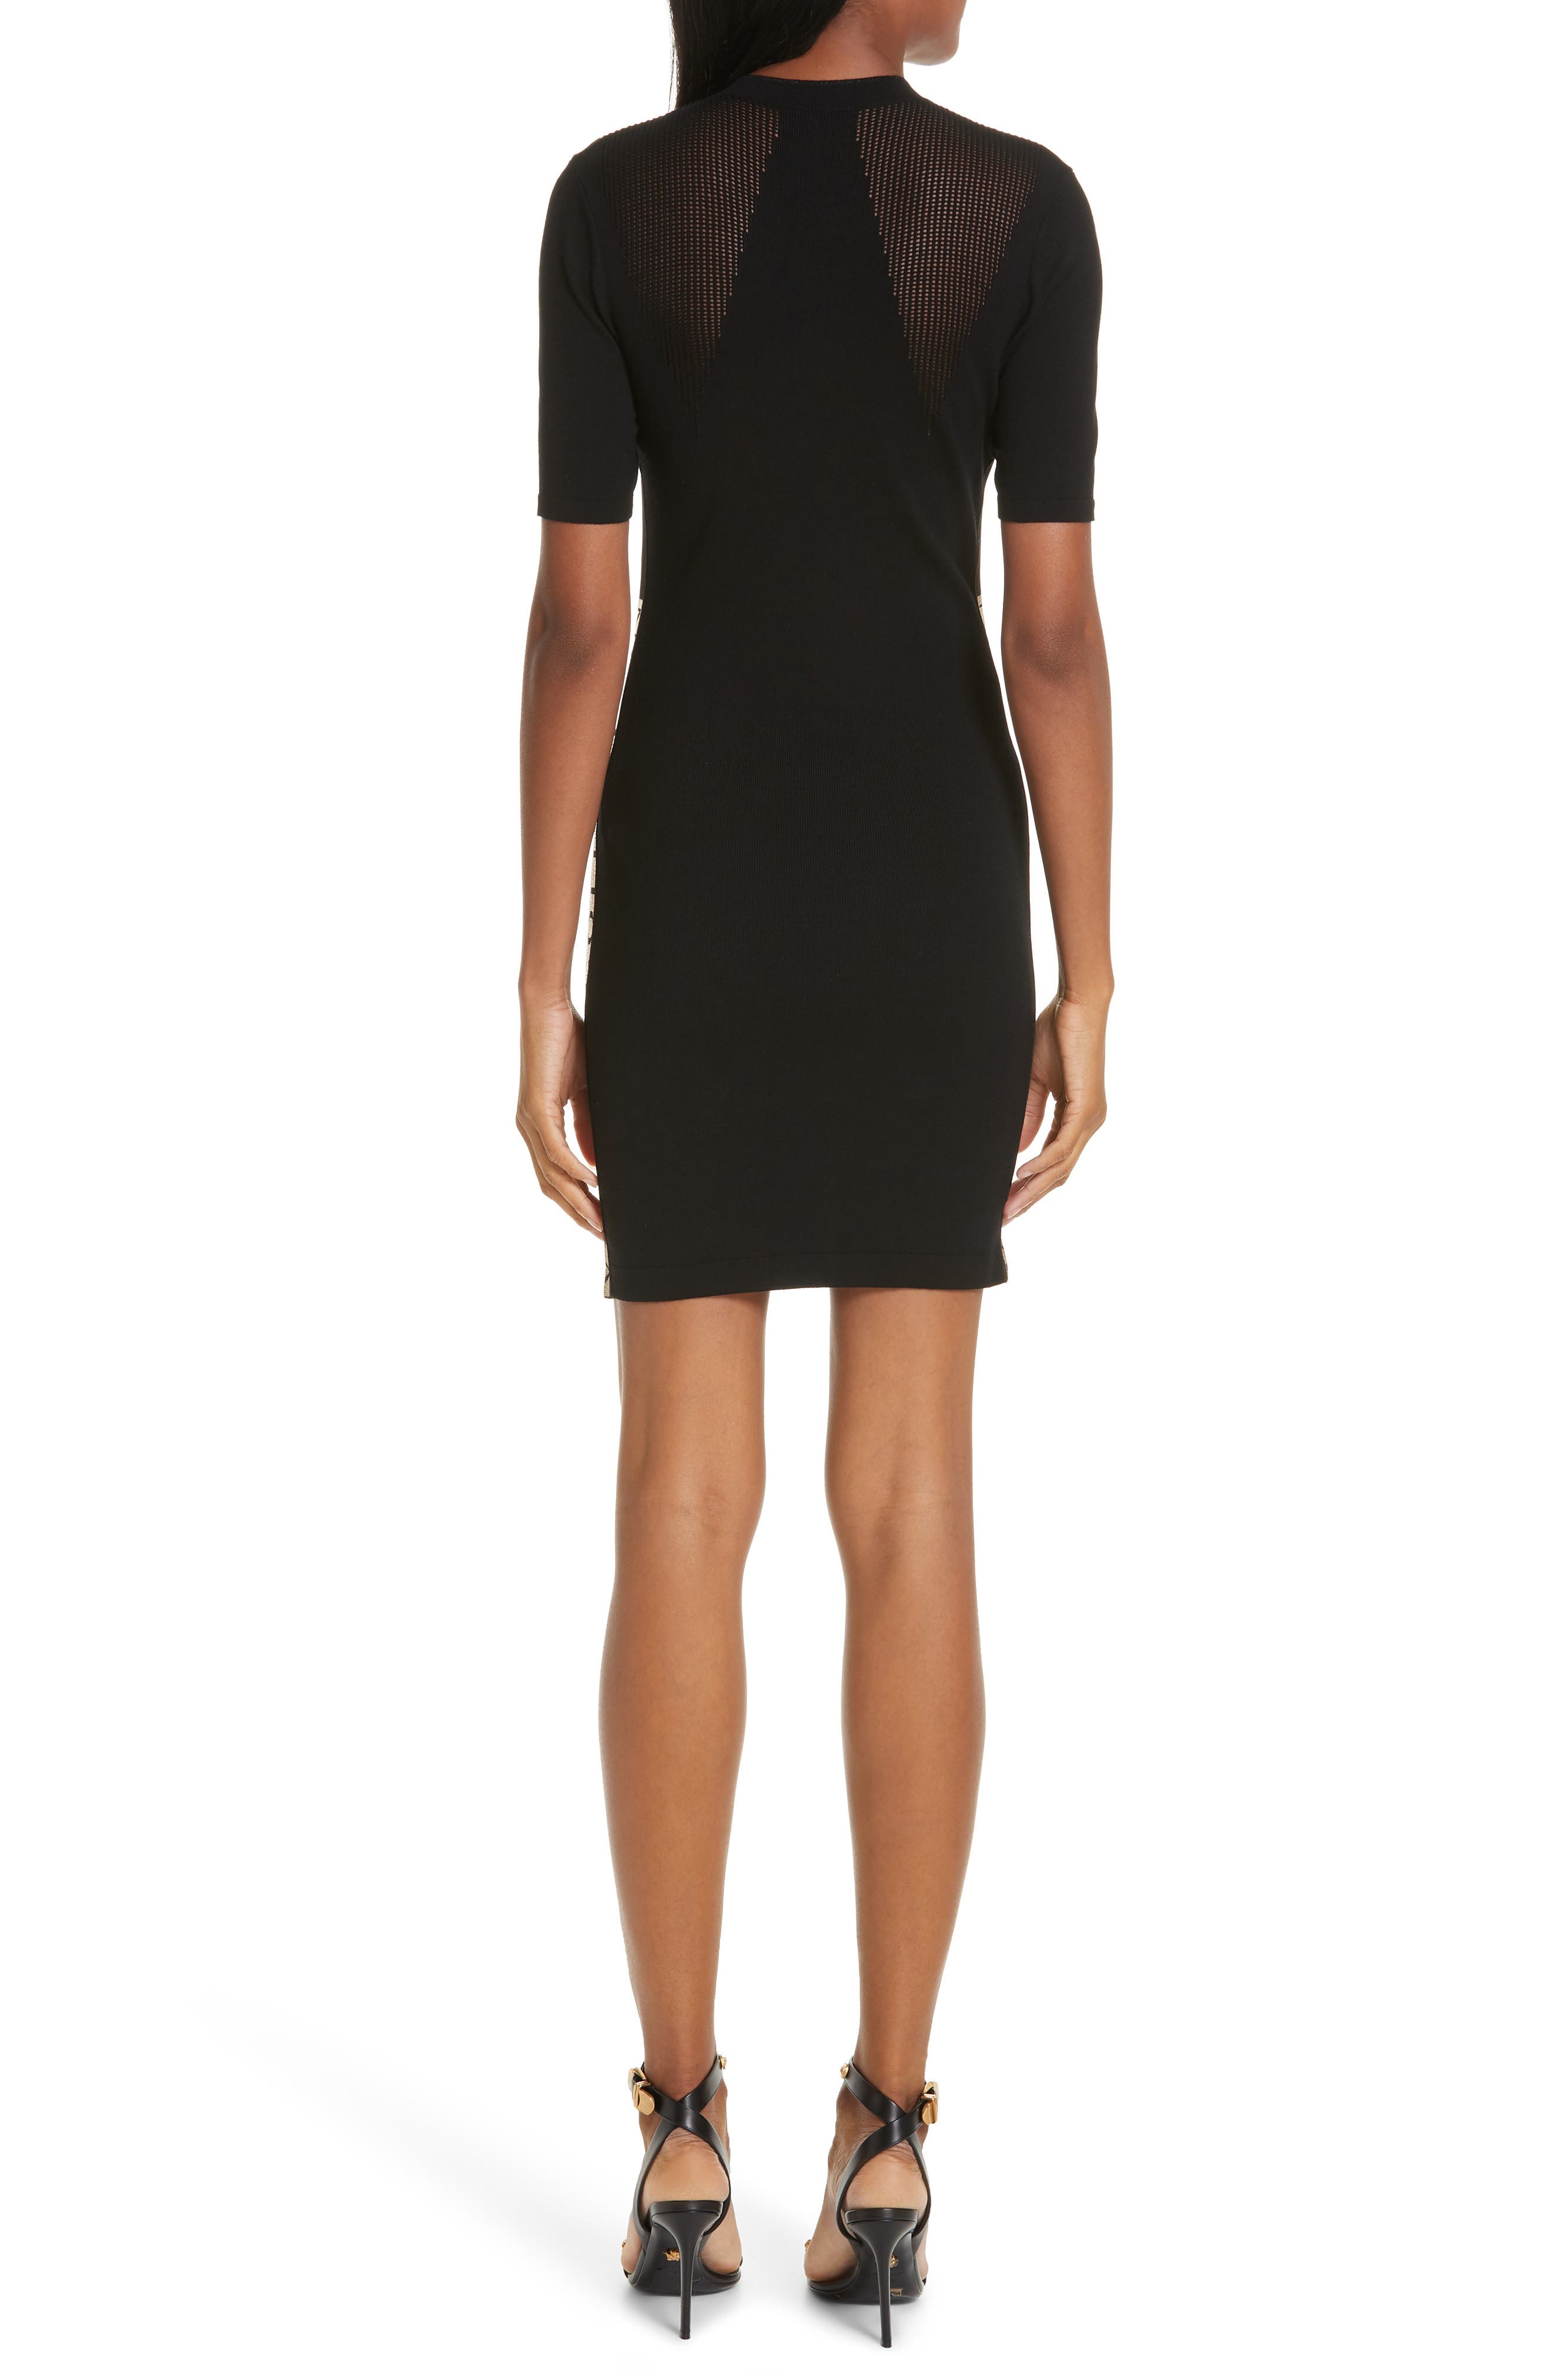 VERSACE COLLECTION, Logo Trim Body-Con Dress, Alternate thumbnail 2, color, BLACK